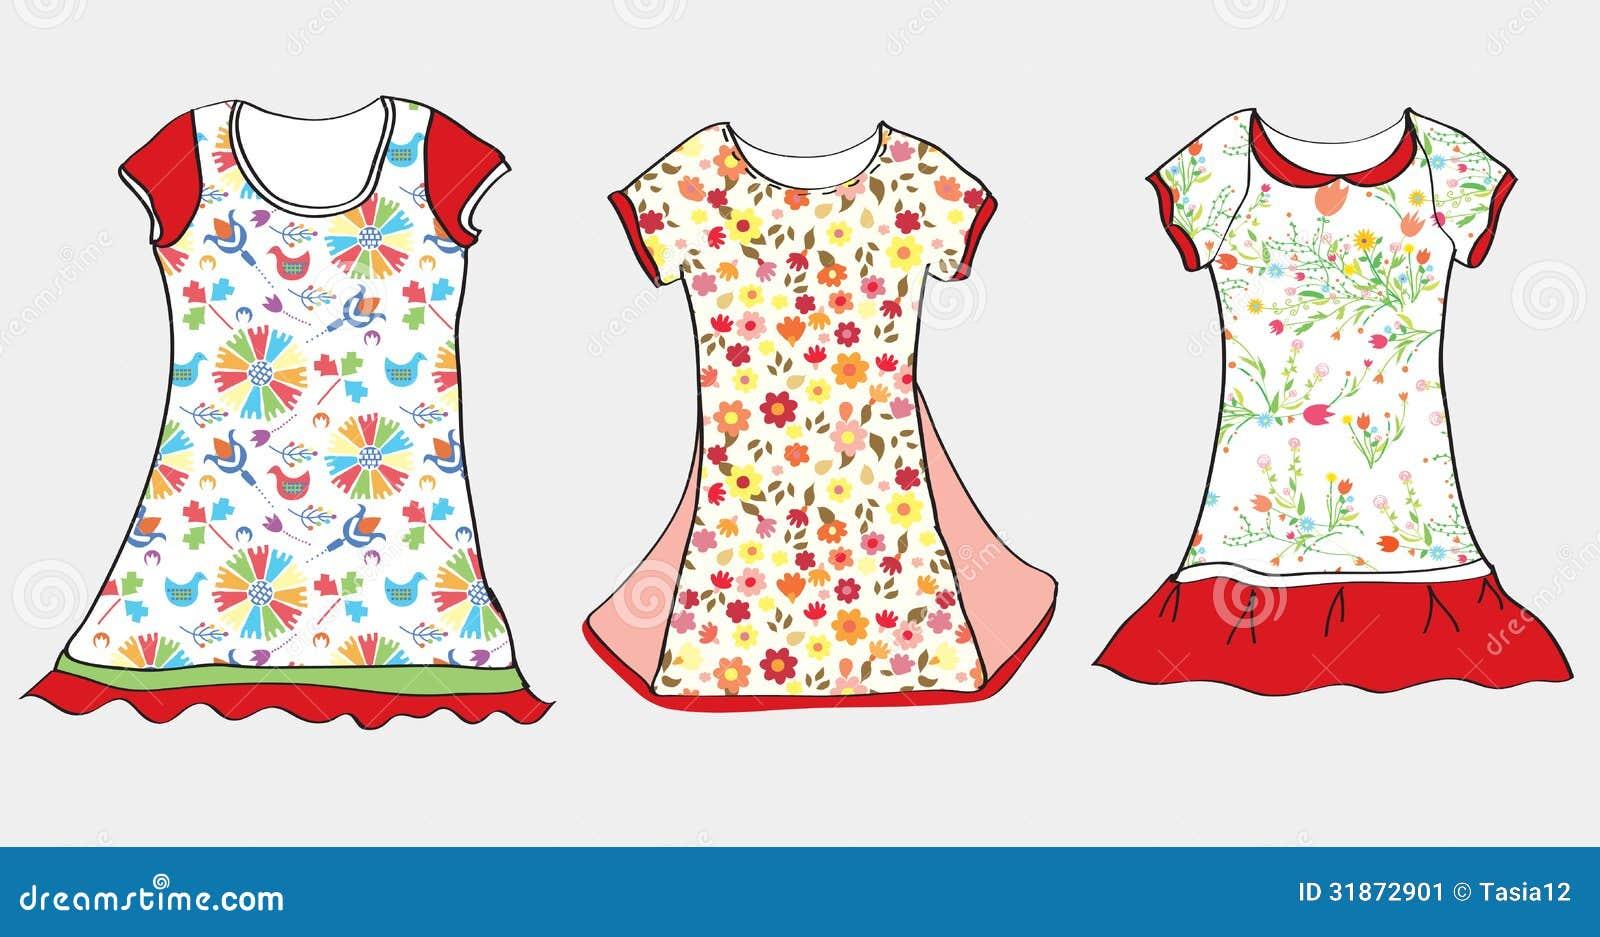 Shirt design in girl - Dresses And T Shirt Design For Girl